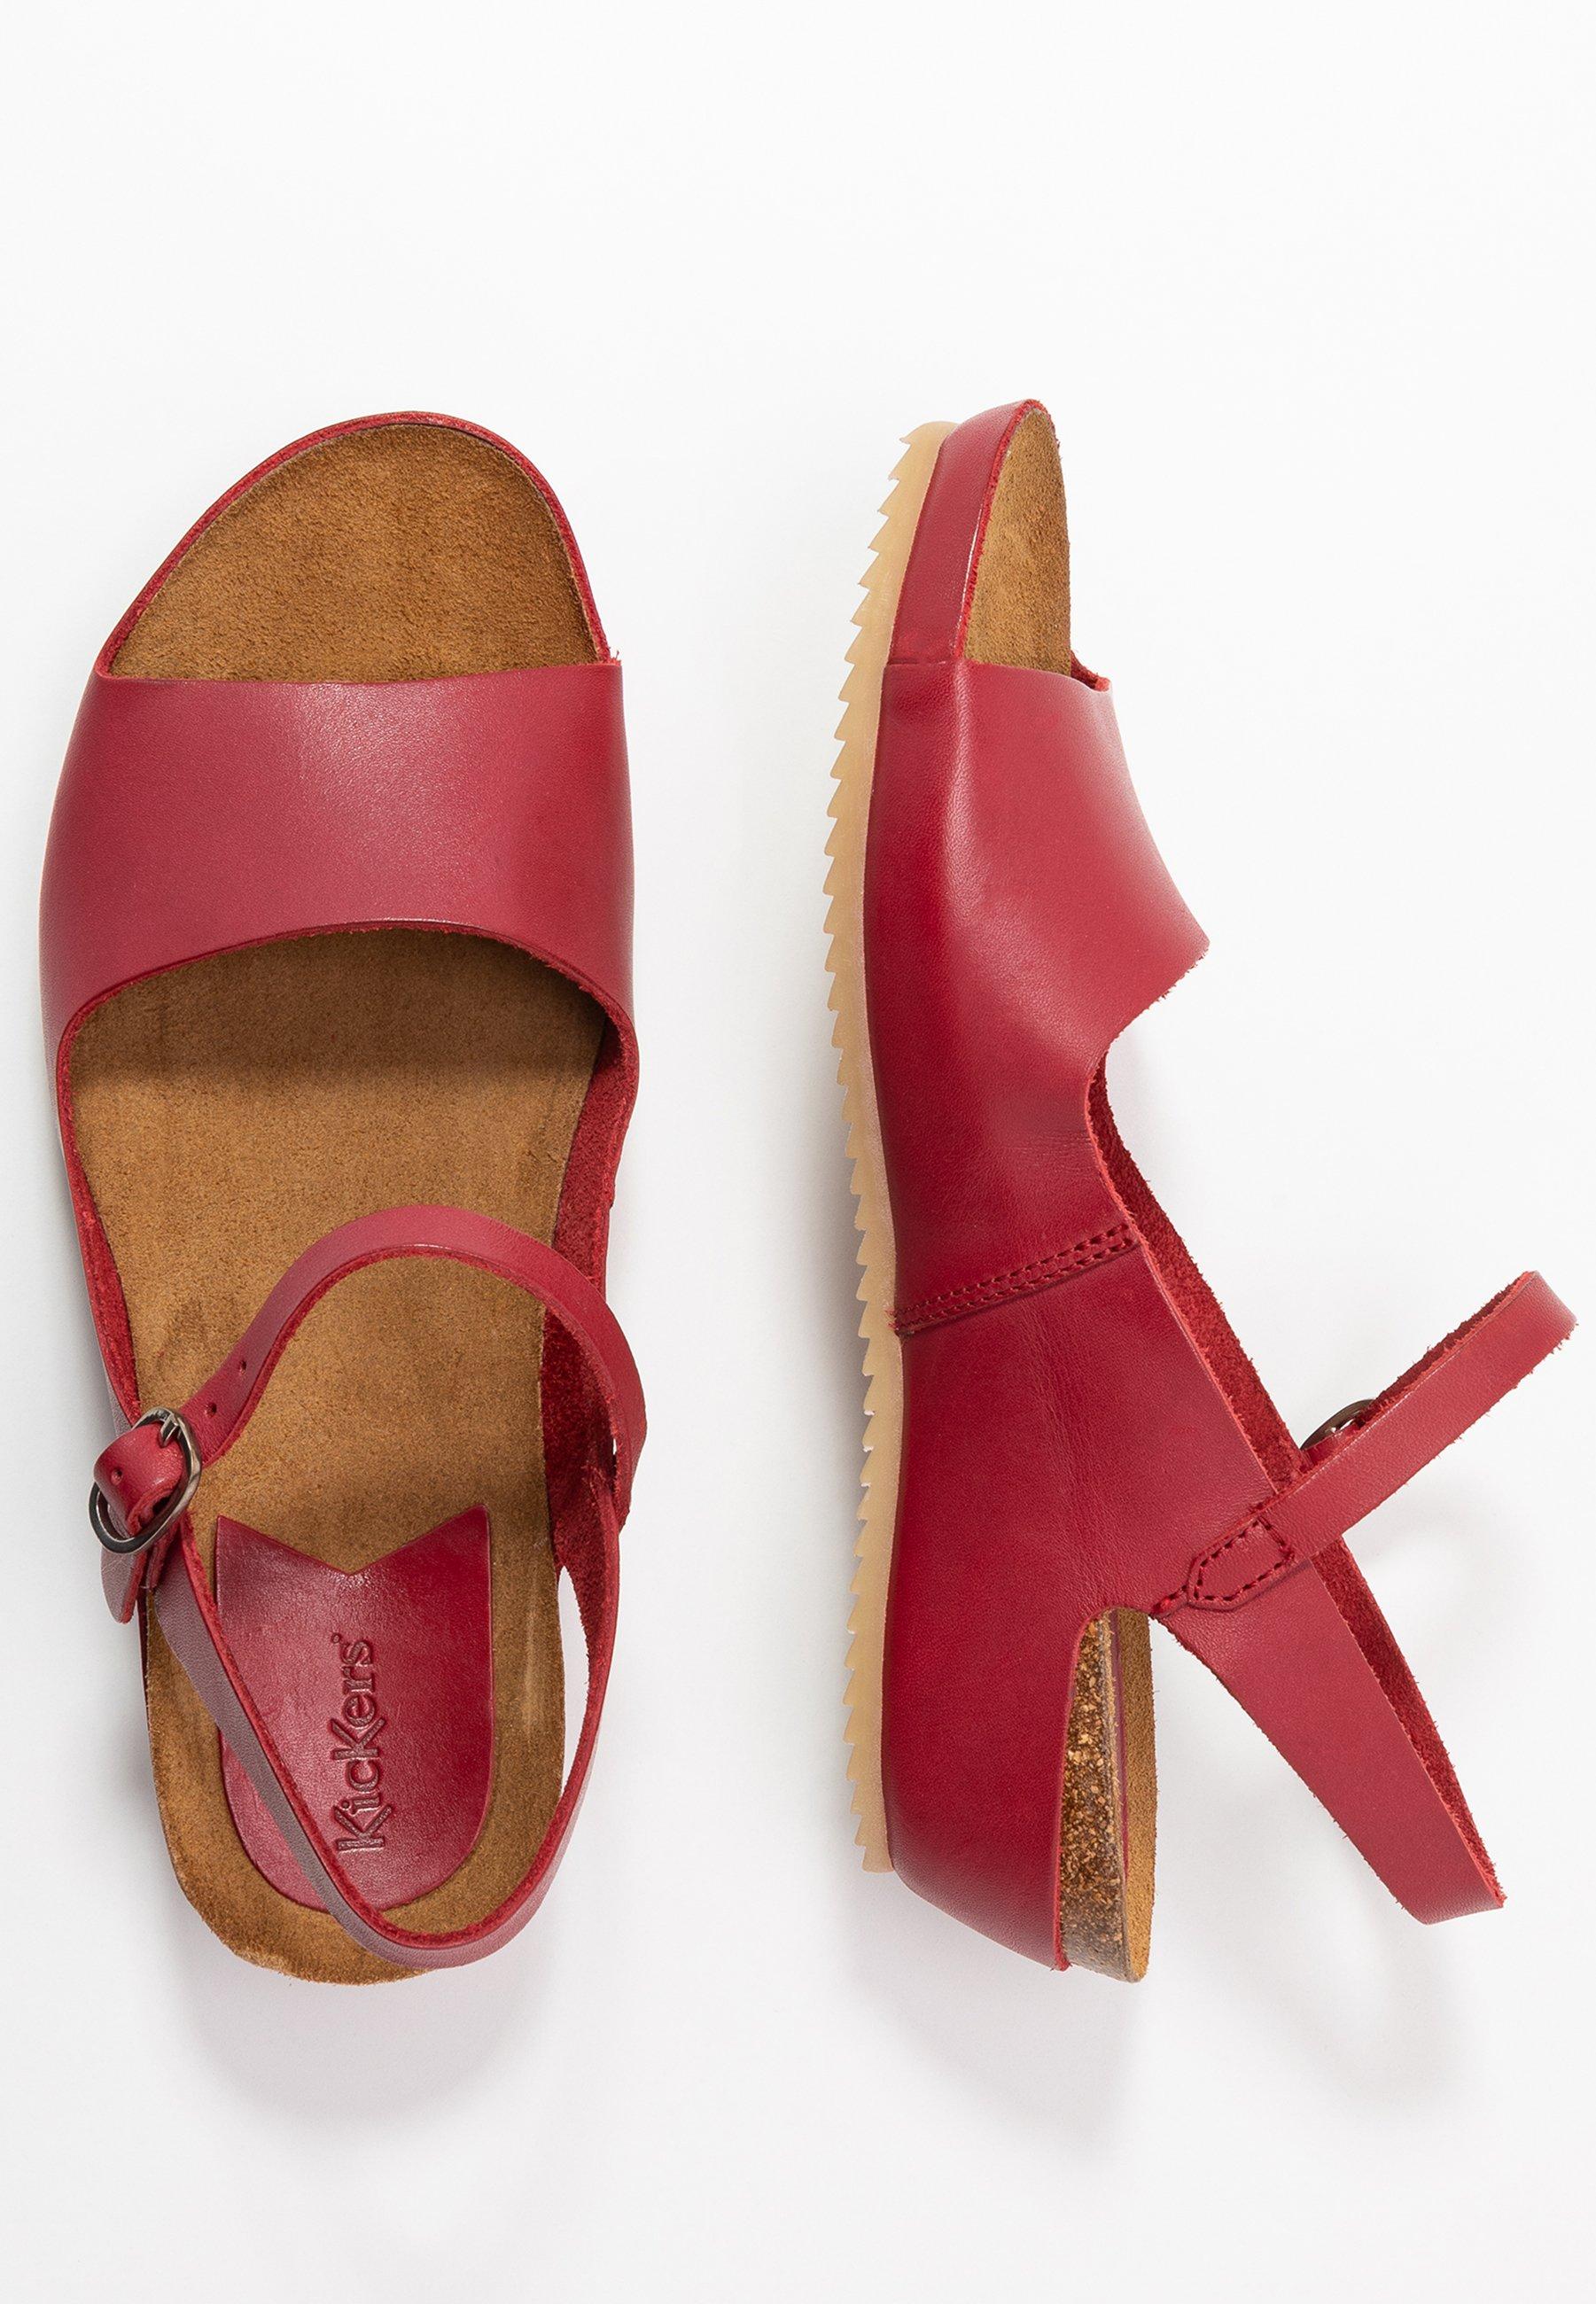 Kickers Takika - Sandaletter Med Kilklack Rouge